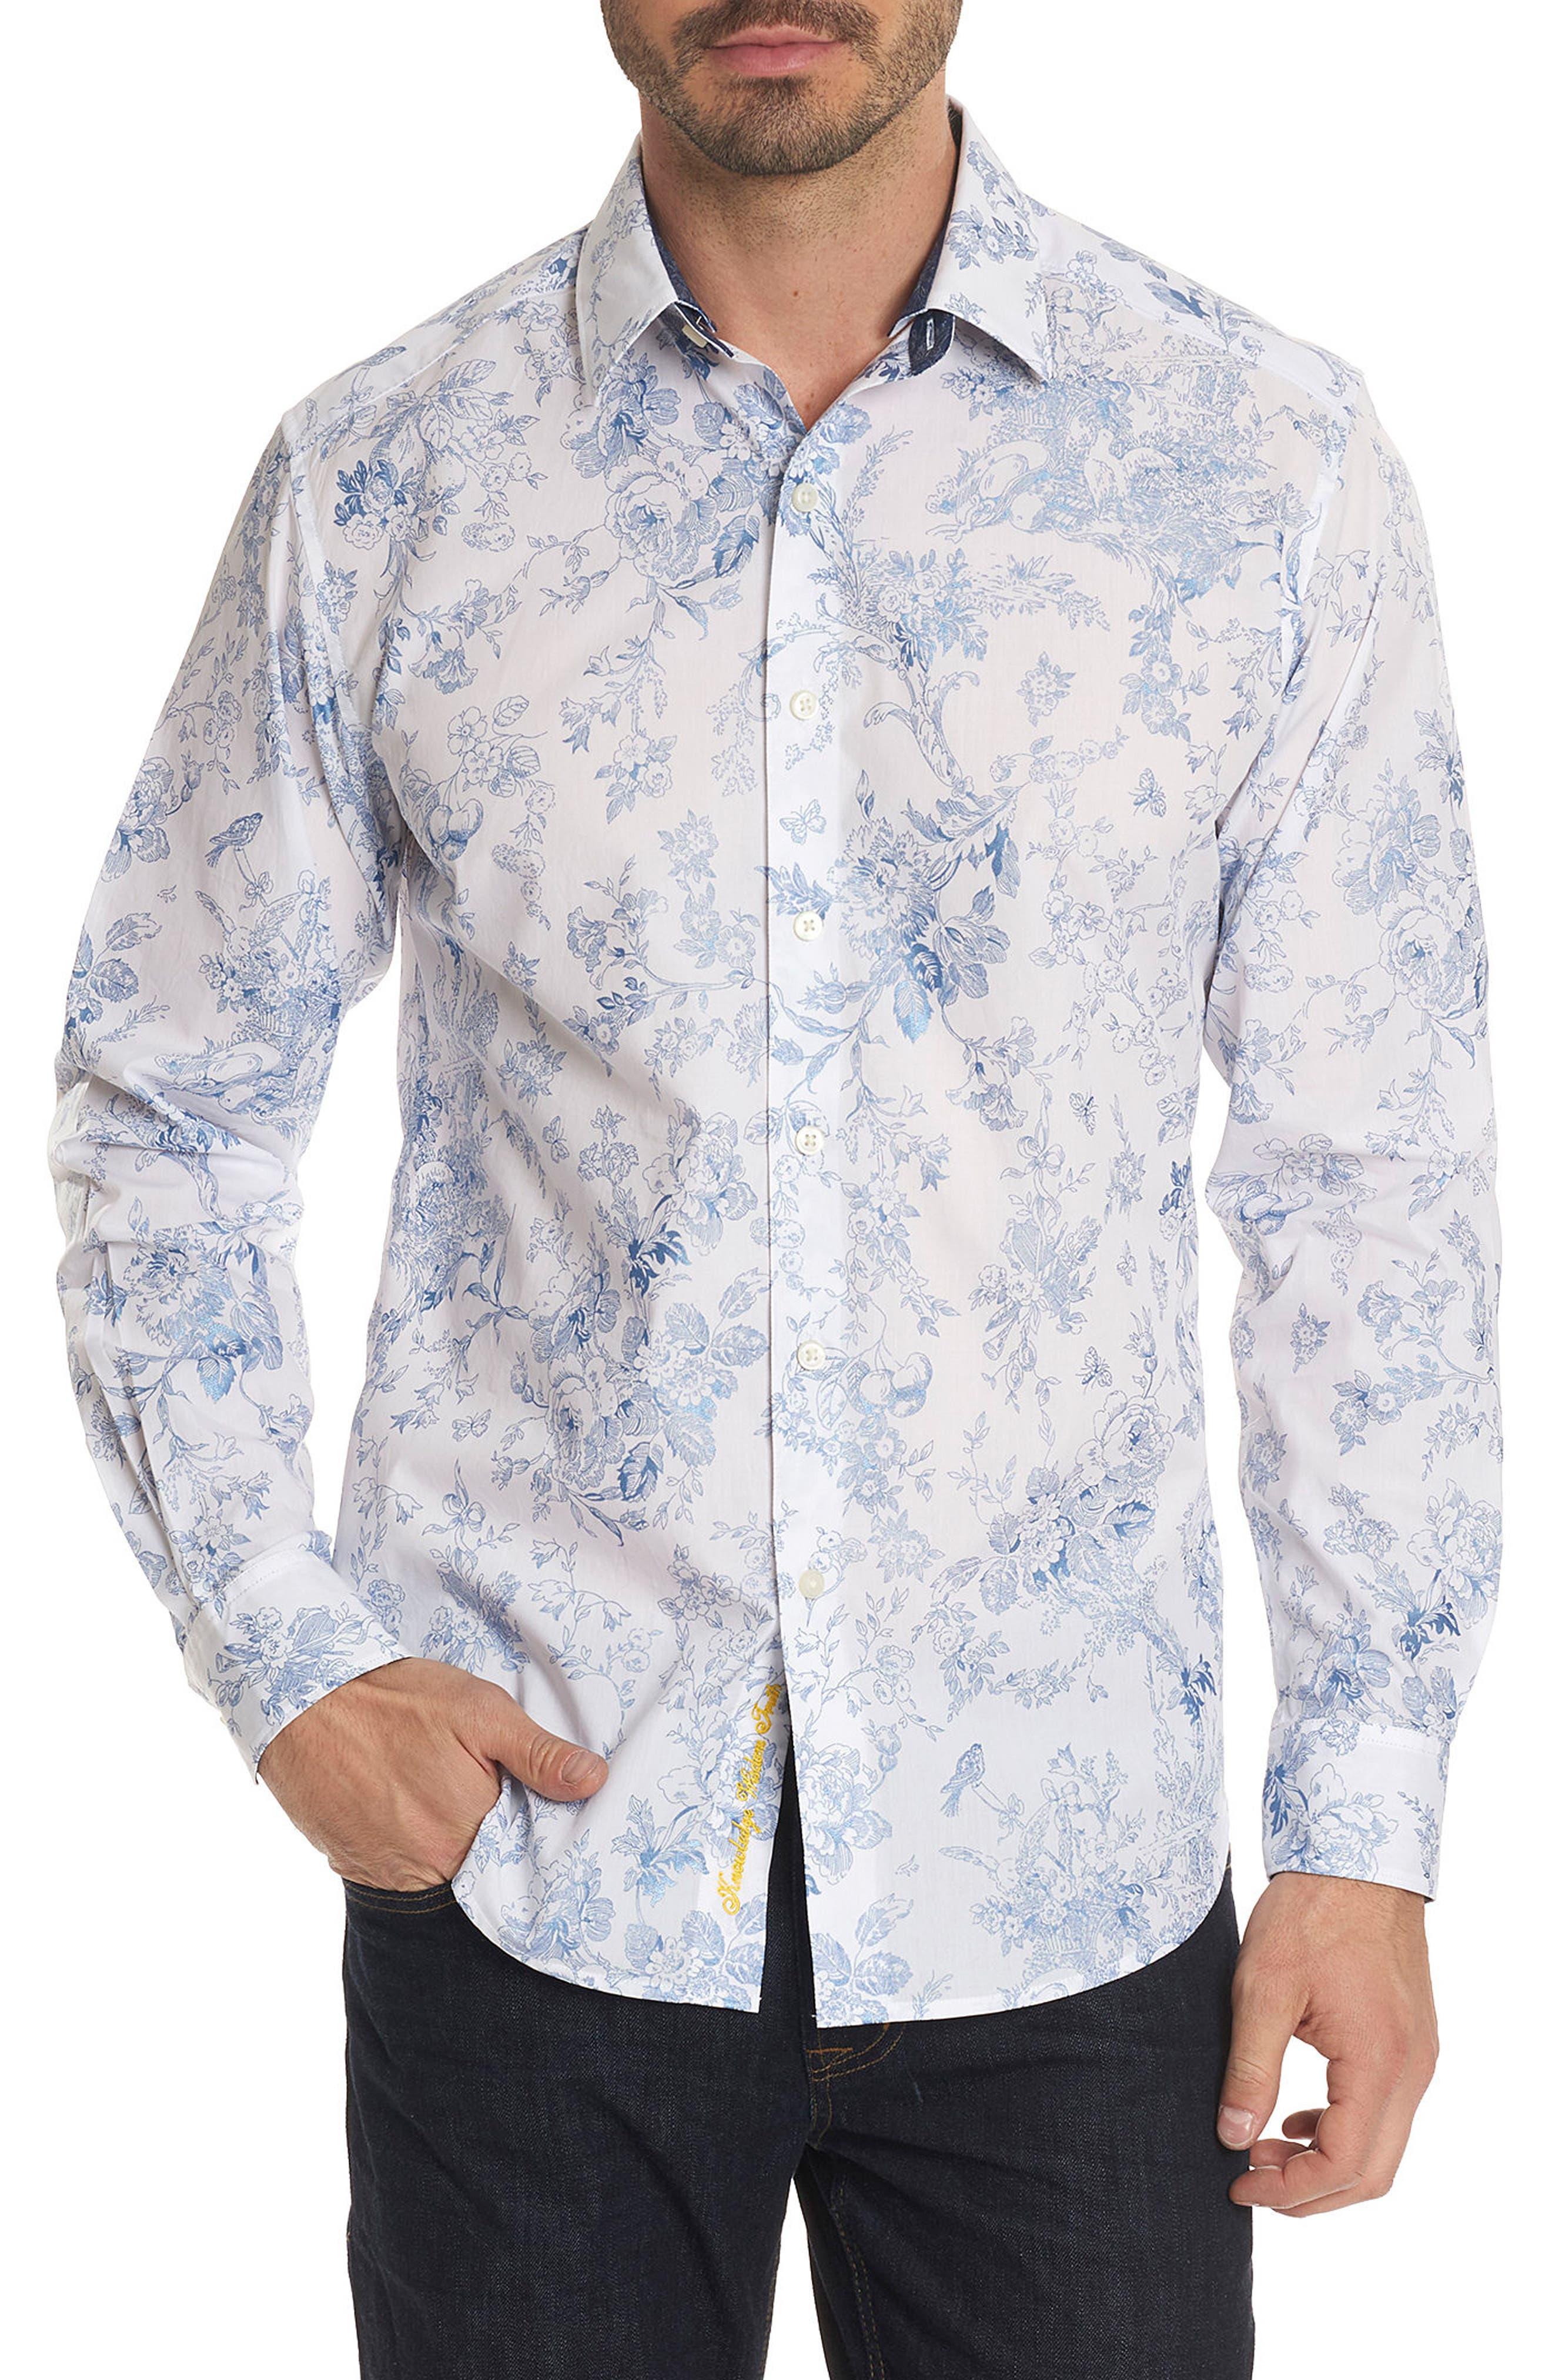 Rider Classic Fit Sport Shirt,                             Main thumbnail 1, color,                             White